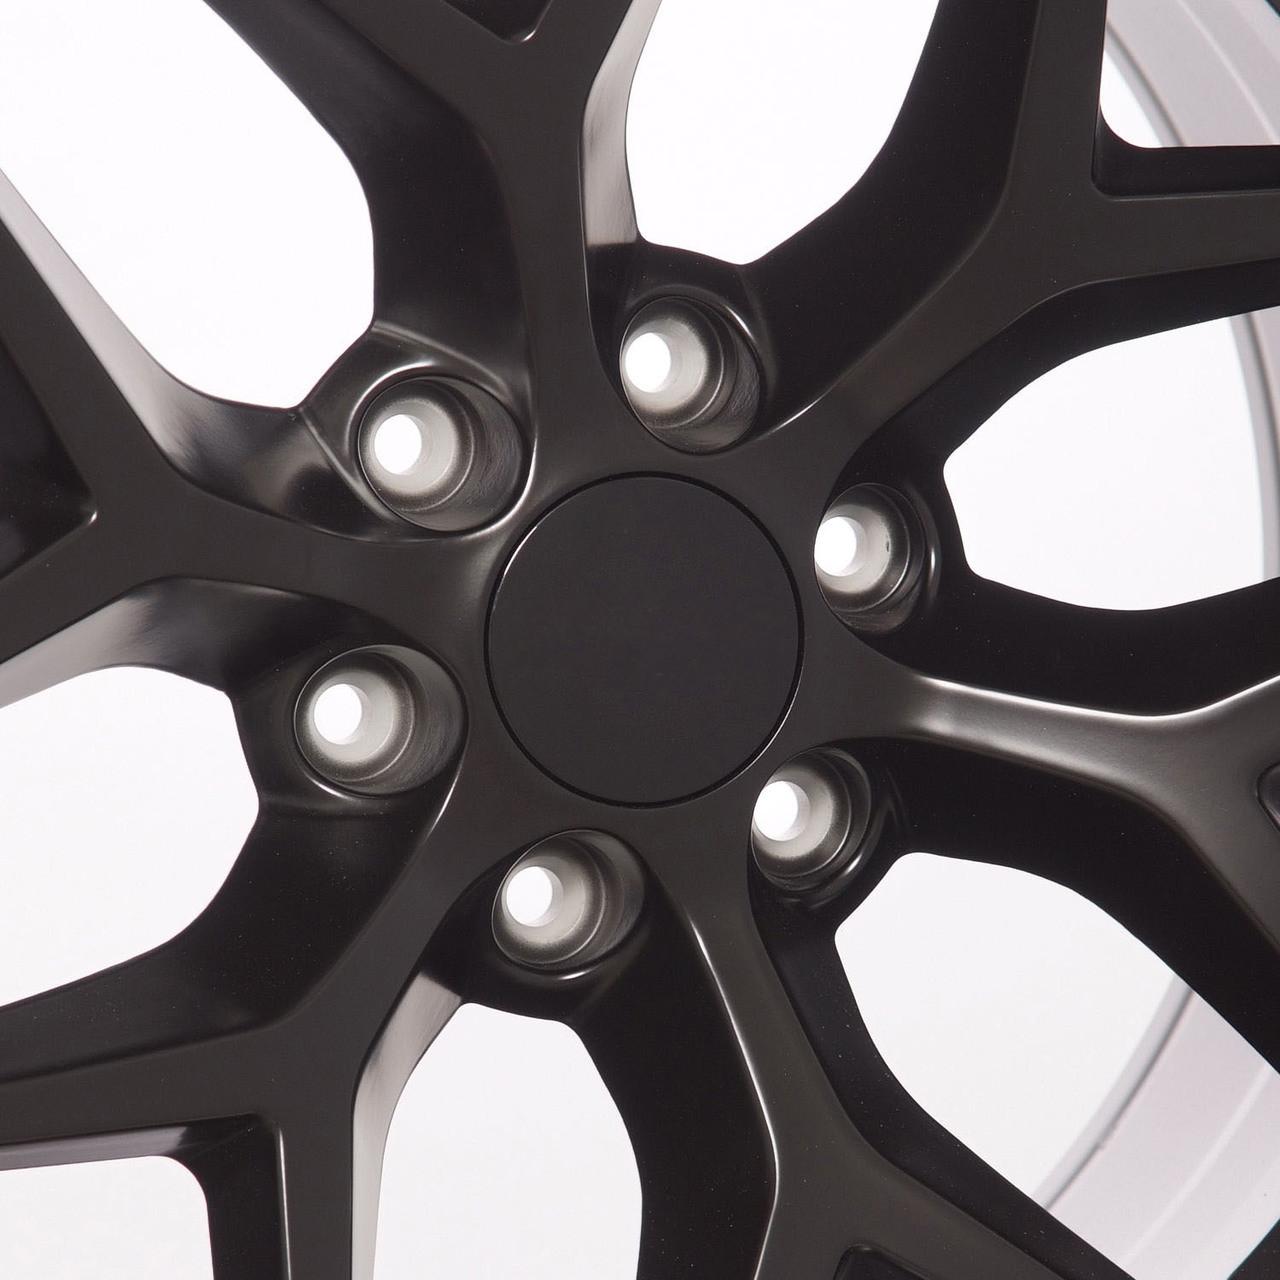 "Satin Matte Black 20"" Snowflake Wheels for GMC Sierra, Yukon, Denali - New Set of 4"